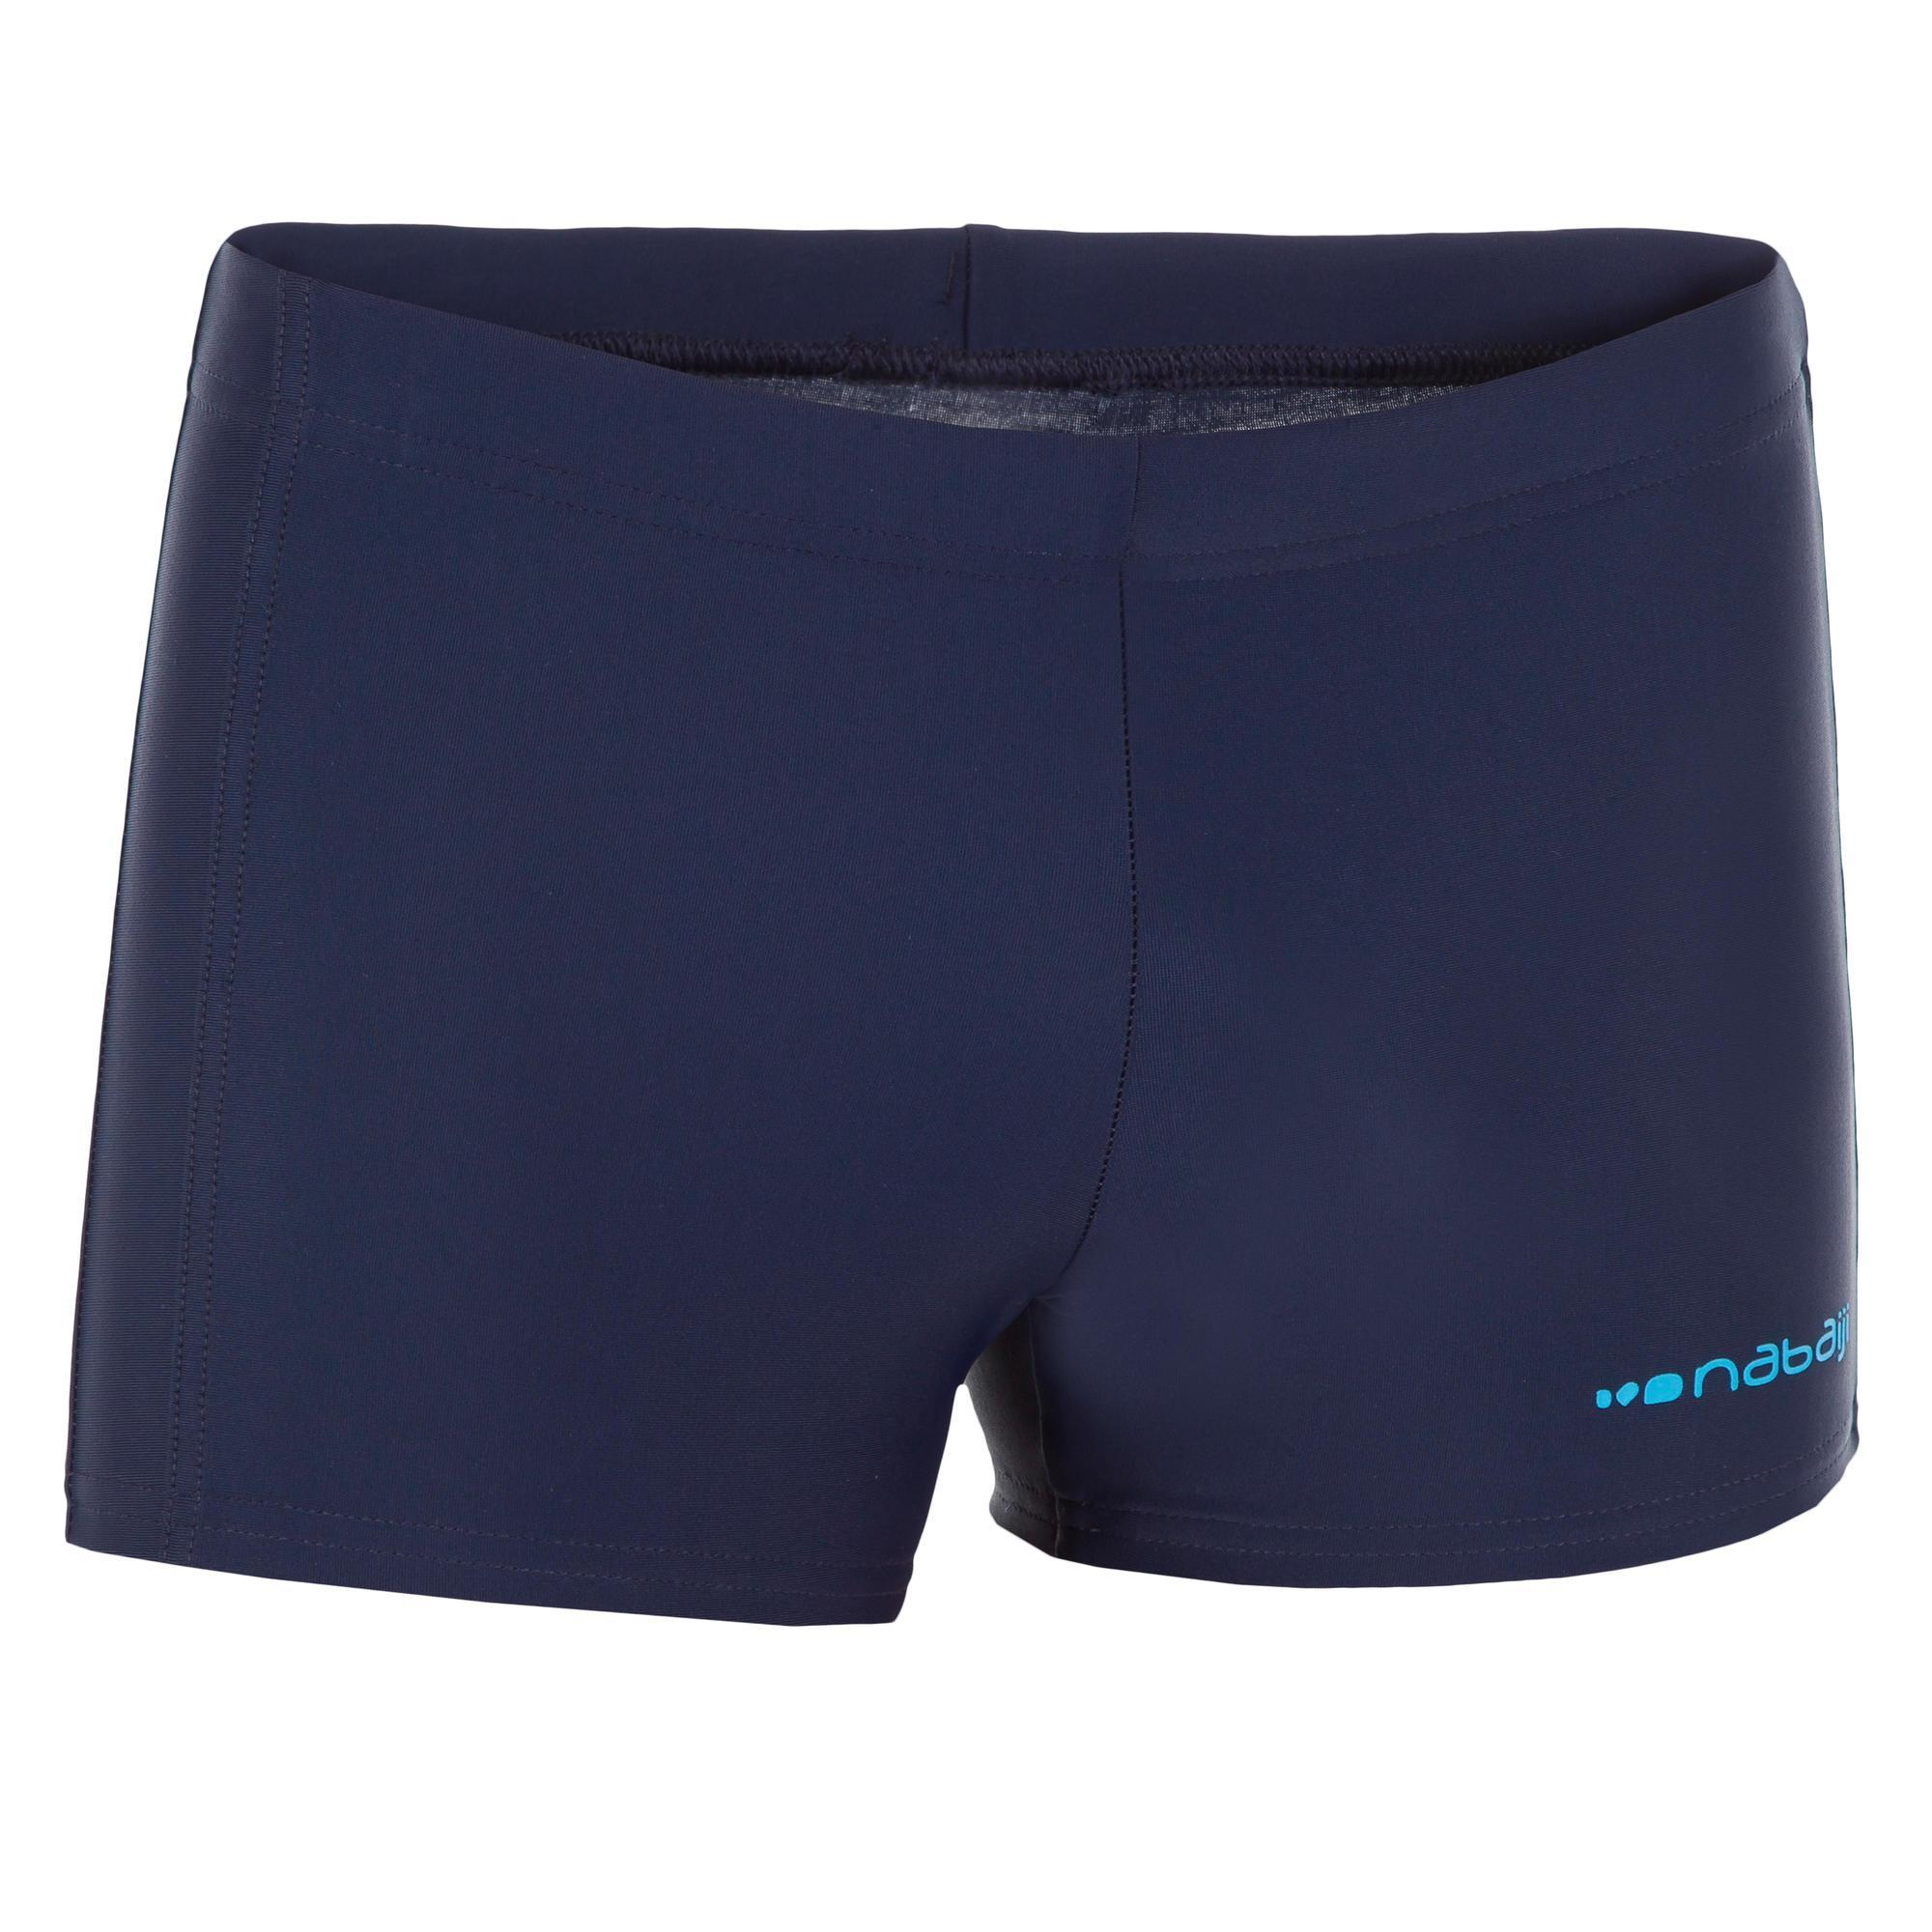 Jungen,Kinder Badehose Boxer 100 Plus Pip Jungen blau | 03583788269199